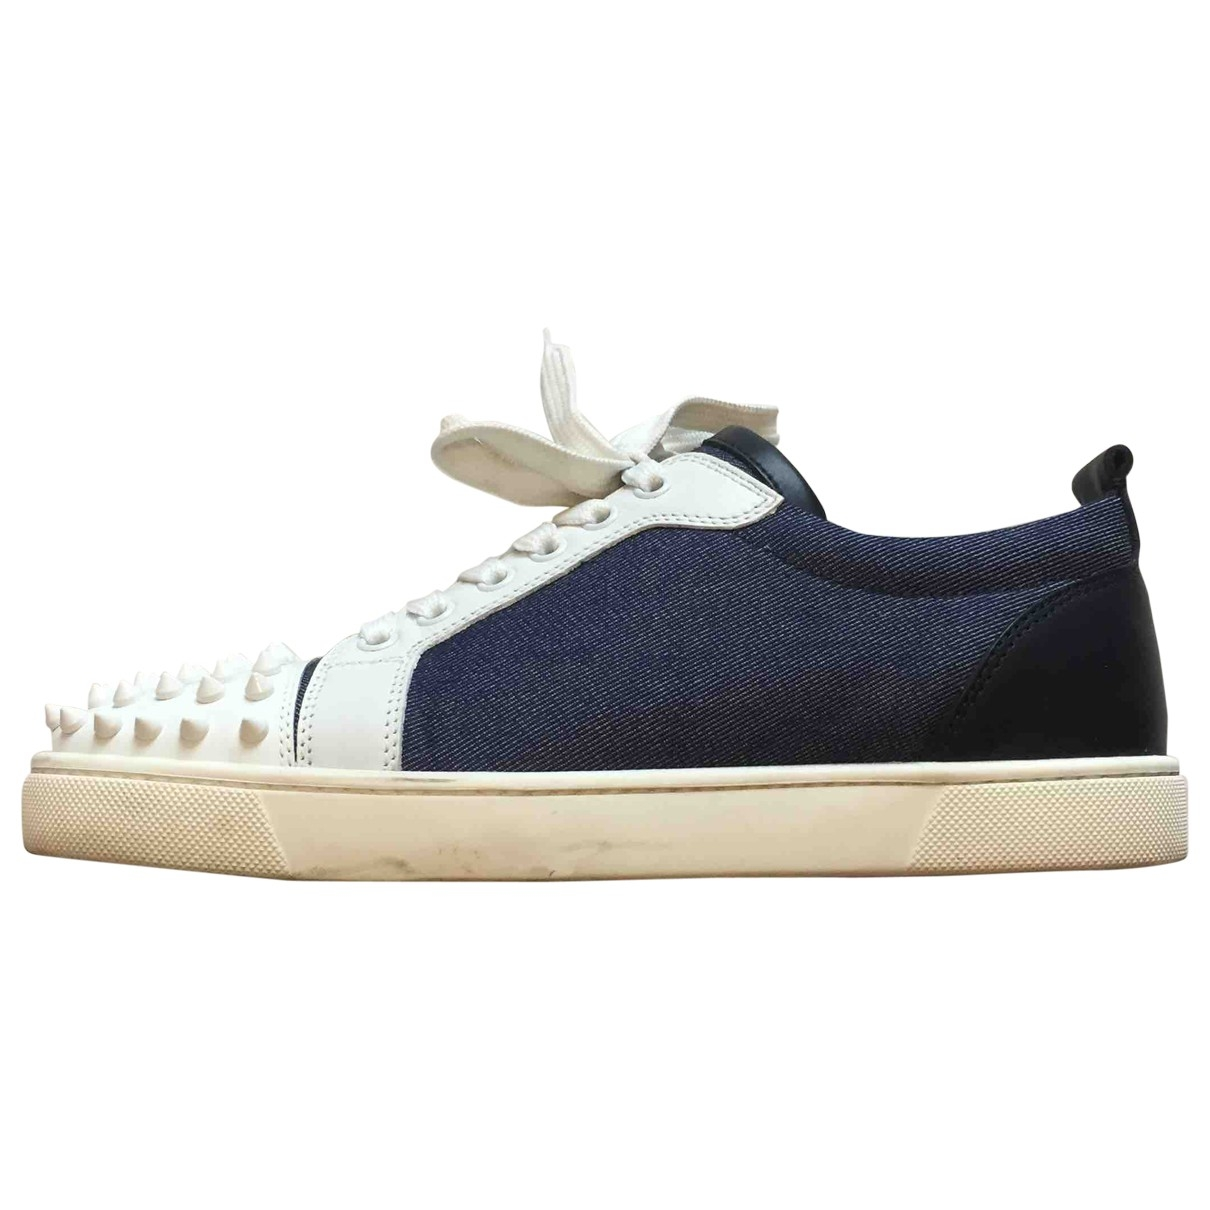 Christian Louboutin Gondolita Blue Cloth Trainers for Women 40.5 EU